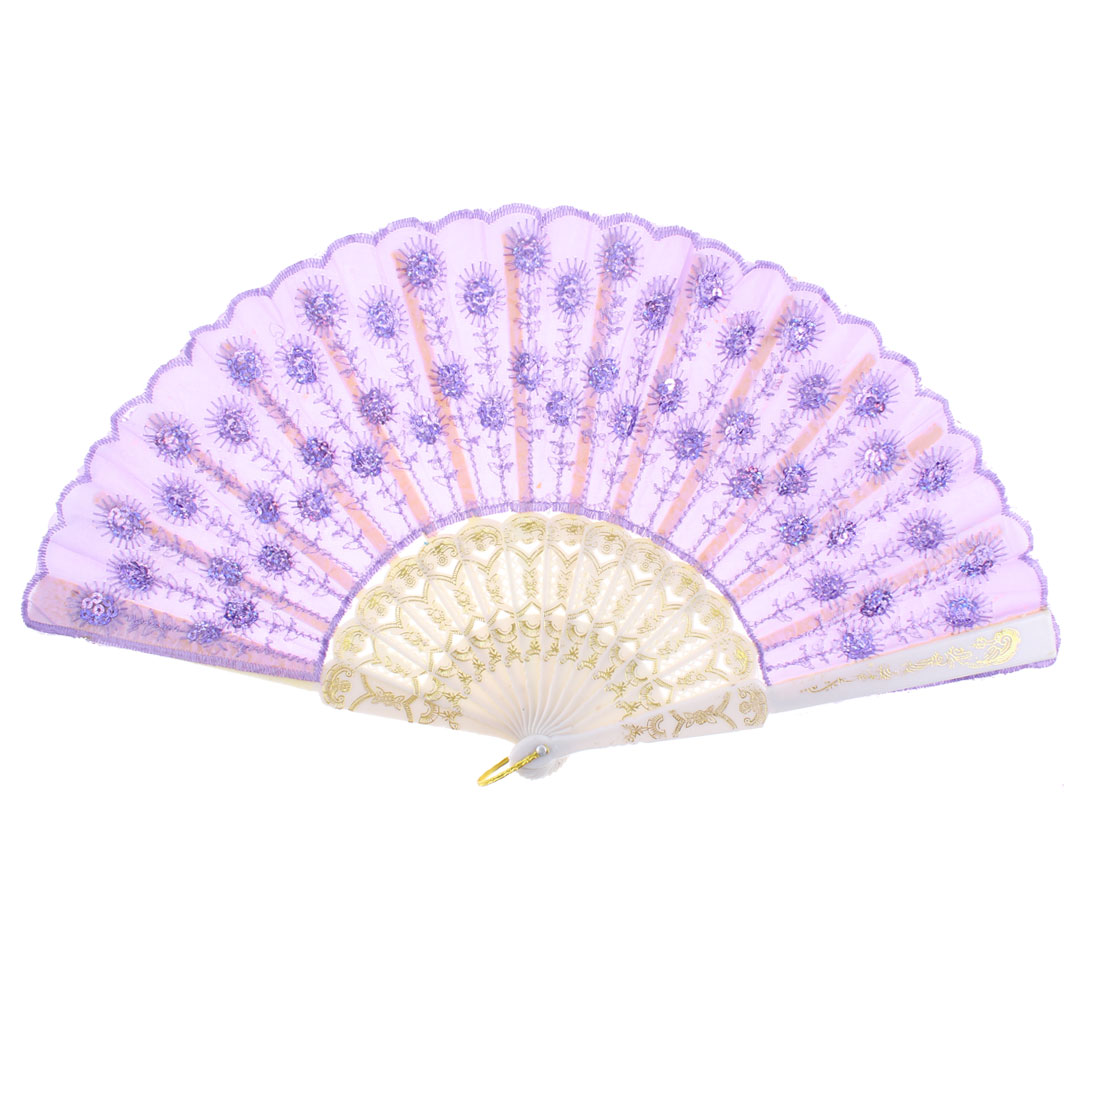 Floral Pattern Dancing Wedding Party Folding Hand Fan Purple for Lady